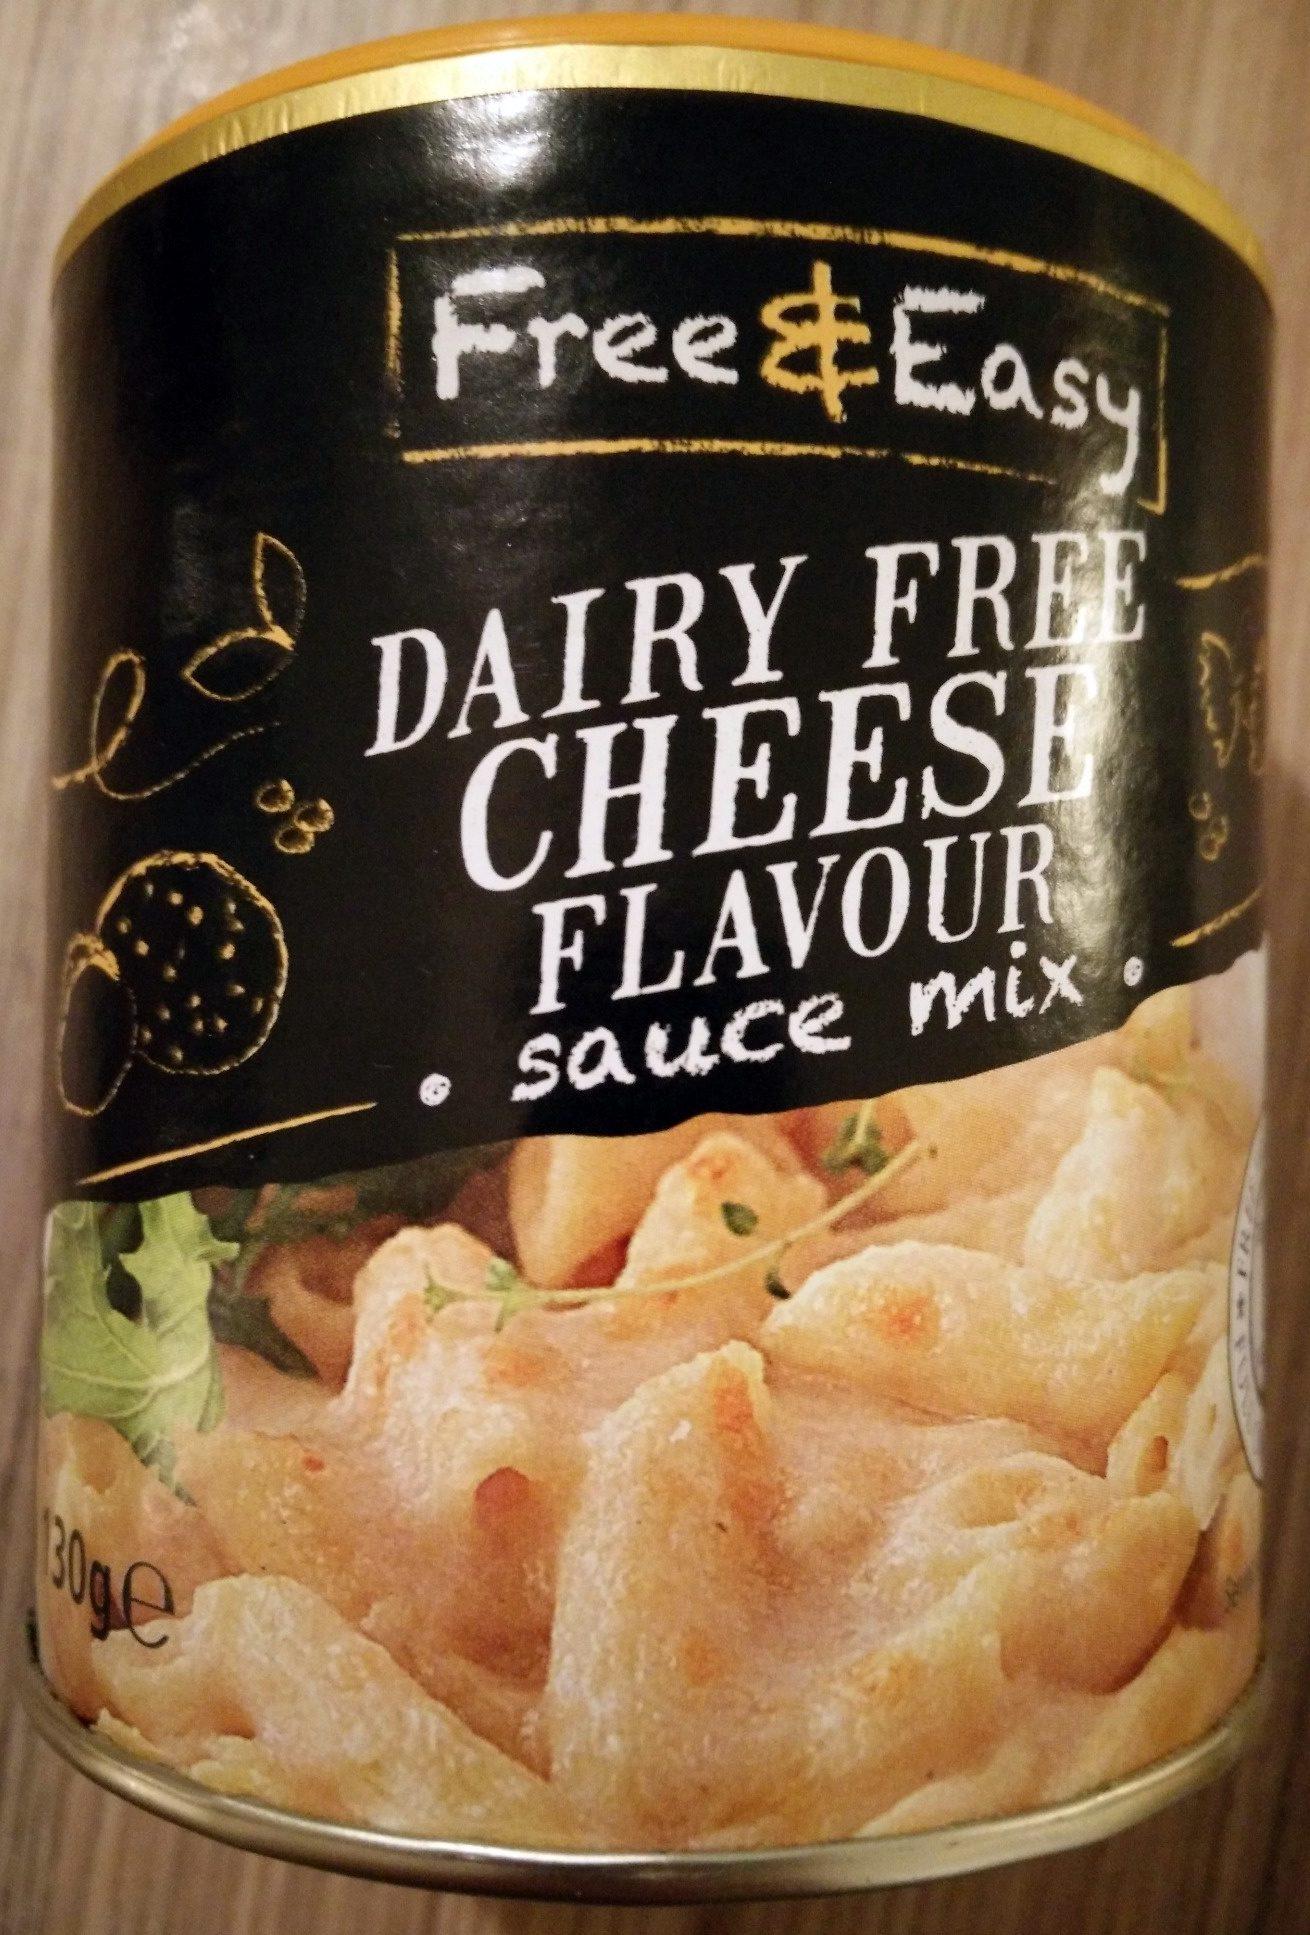 Dairy Free Cheese Flavour Sauce Mix - Produit